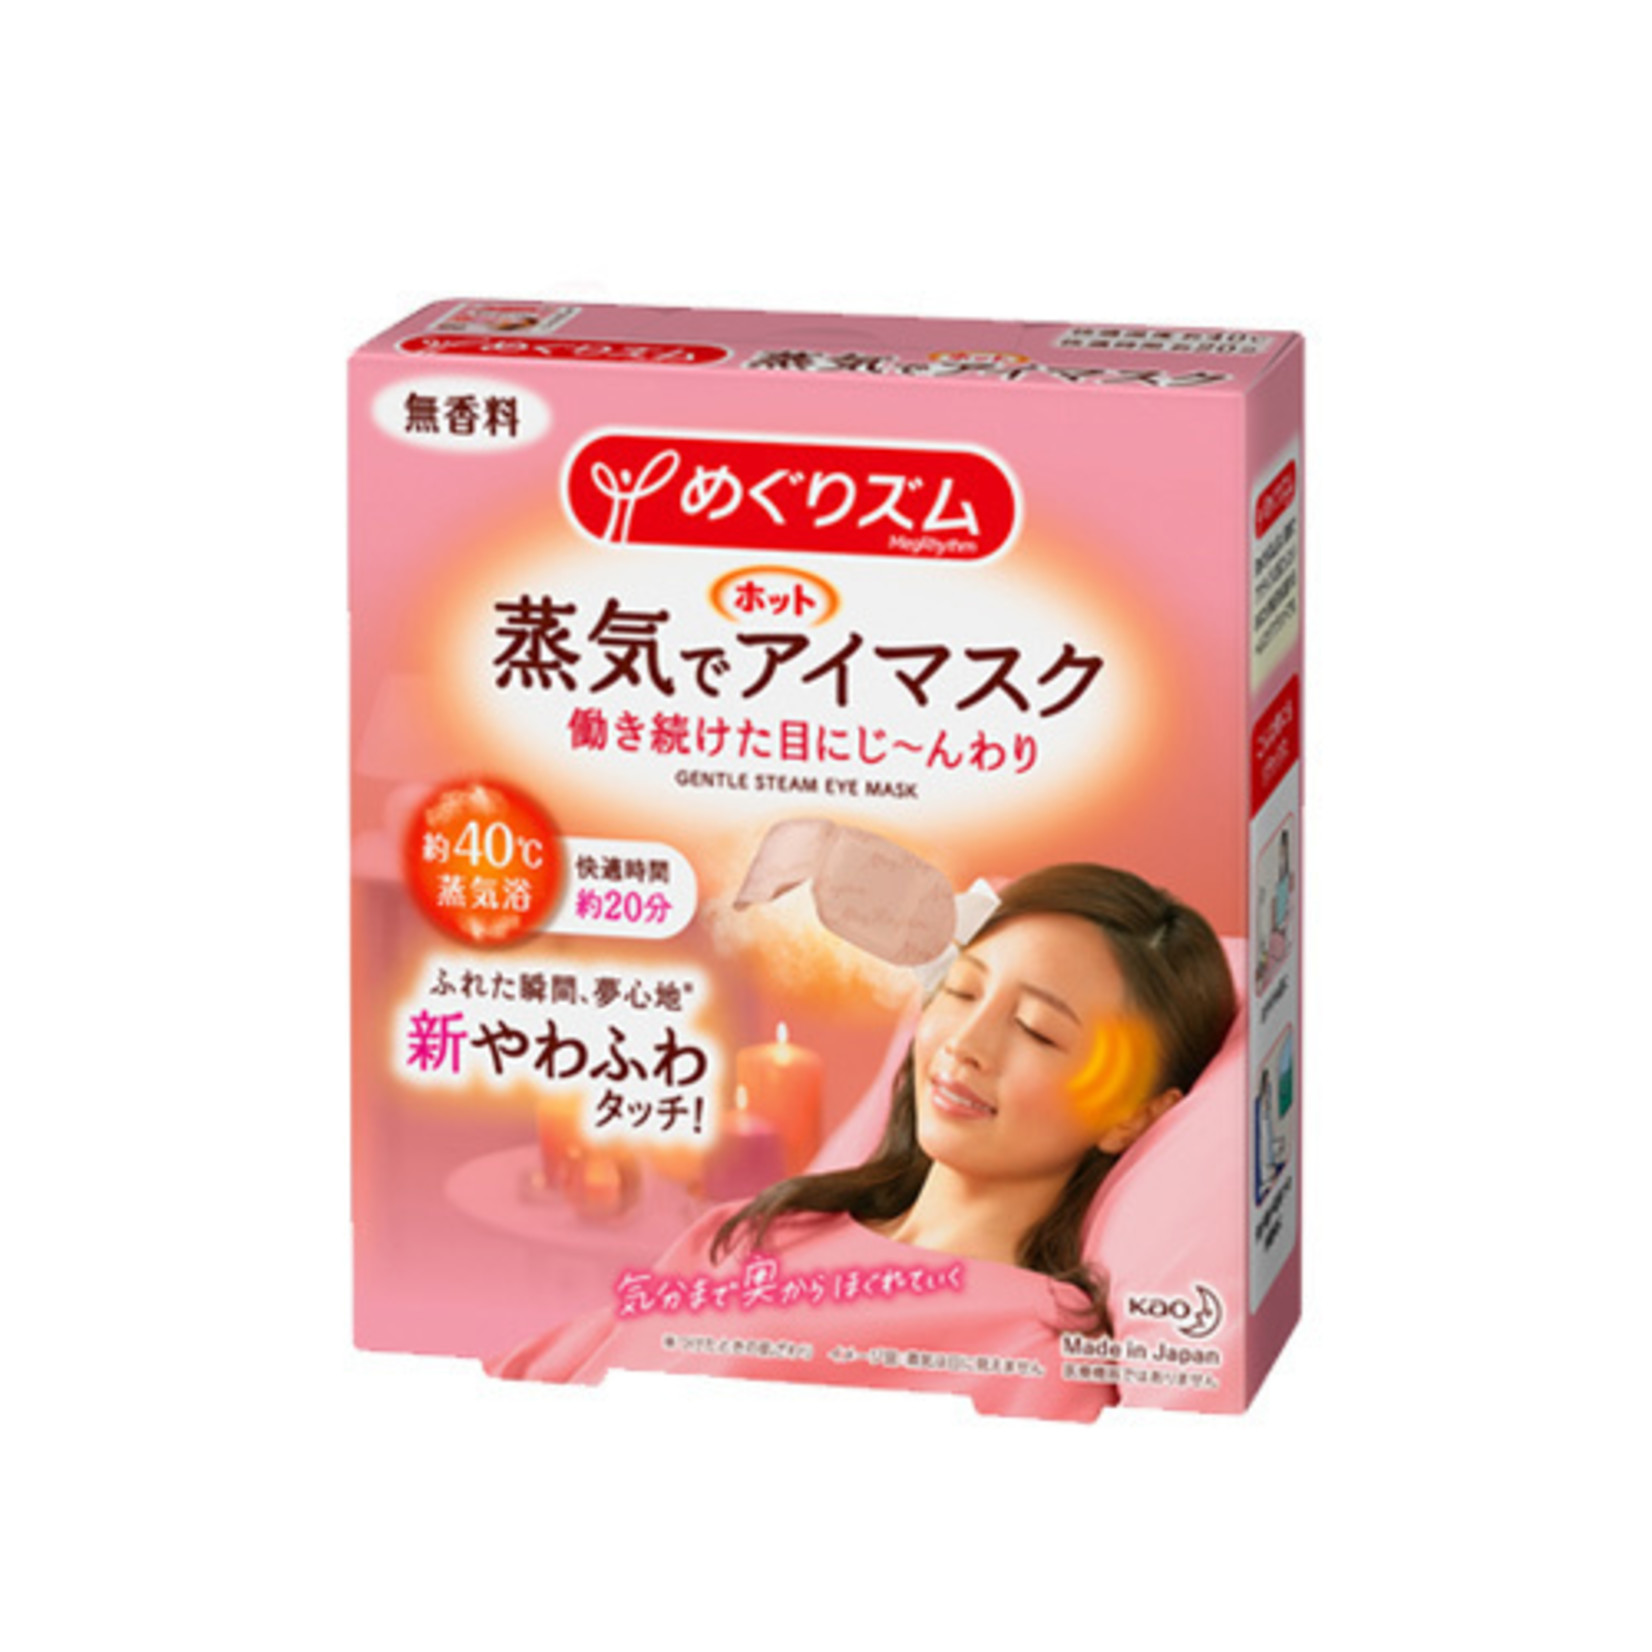 Kao MegRhythm Steam Eye Mask Mix Probierset (6+1 Stk)